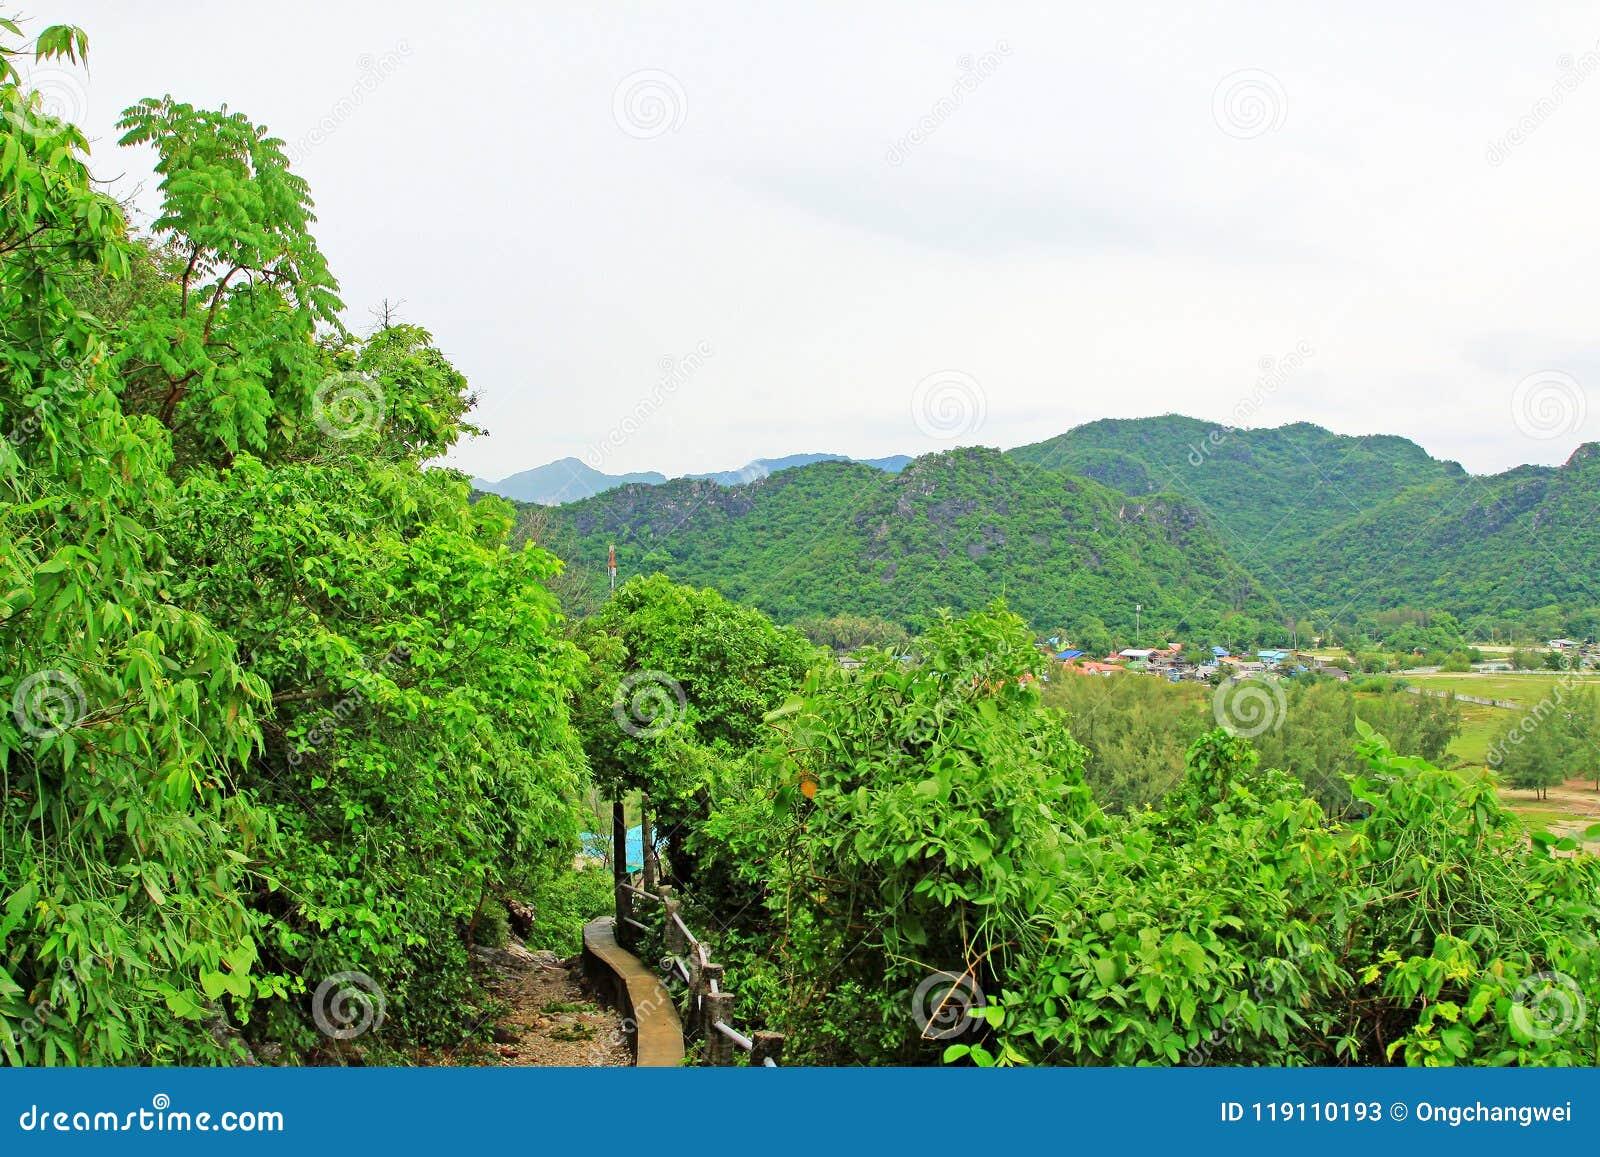 Khao Sam Roi Yot National Park Pathway, Thailand